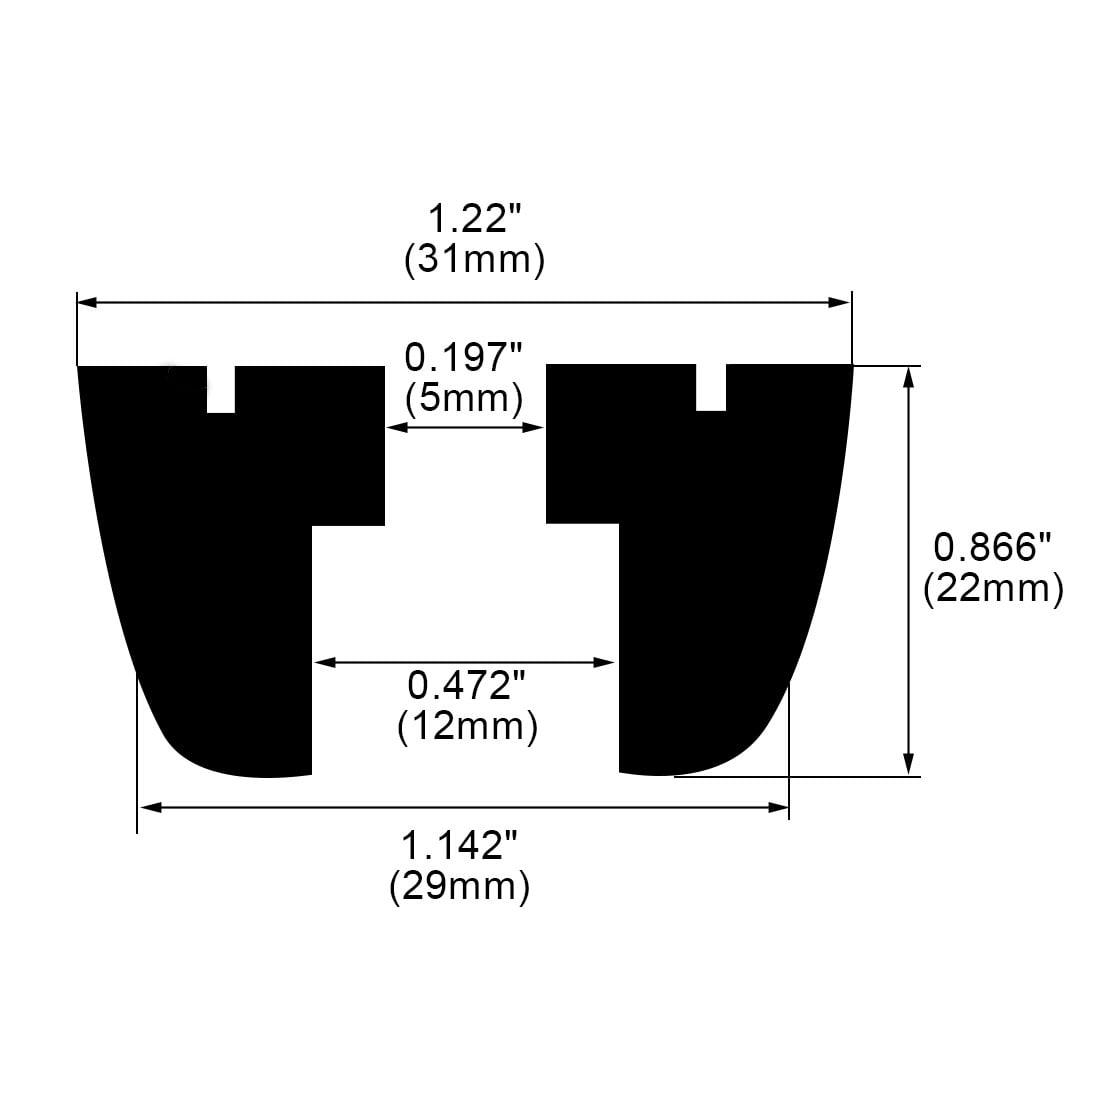 32pcs Rubber Feet Bumpers Furniture Sofa Desk Amplifier Speaker Cabinet Leg Pads D29x31xH22mm - image 6 de 7